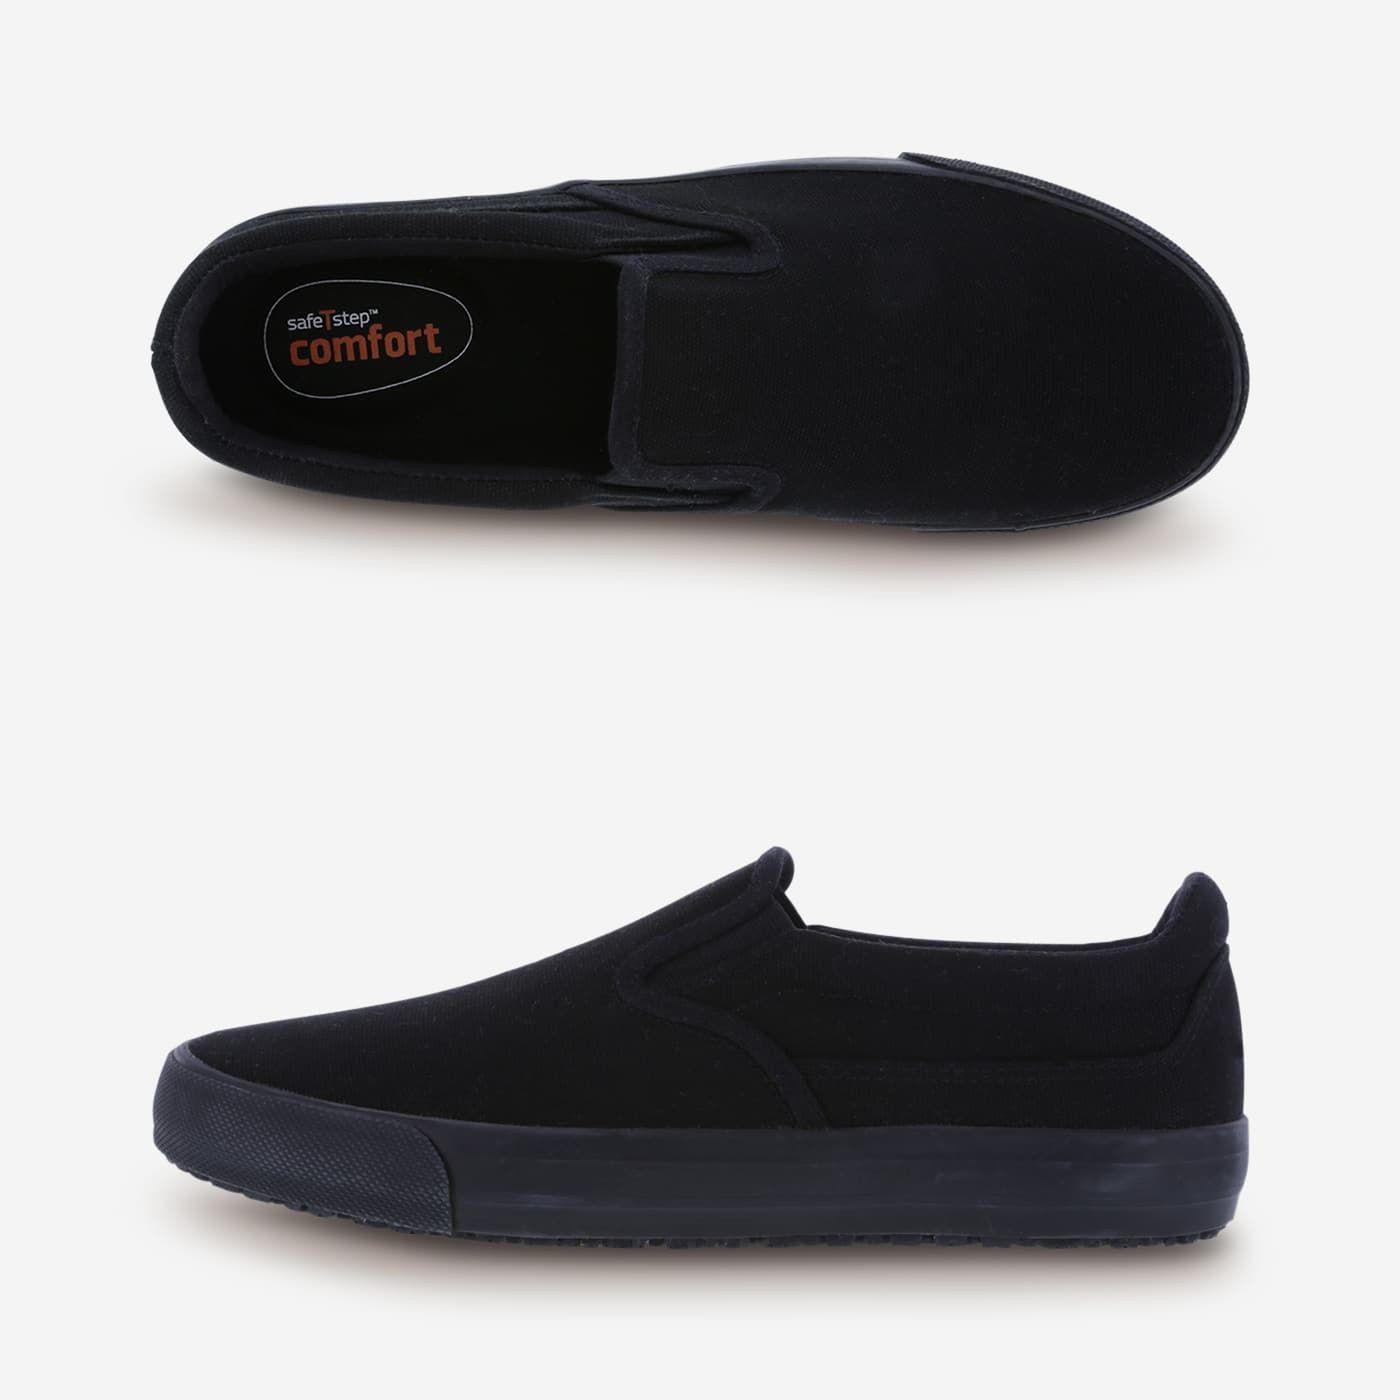 safeTstep Slip-Resistant Men's Slip-On